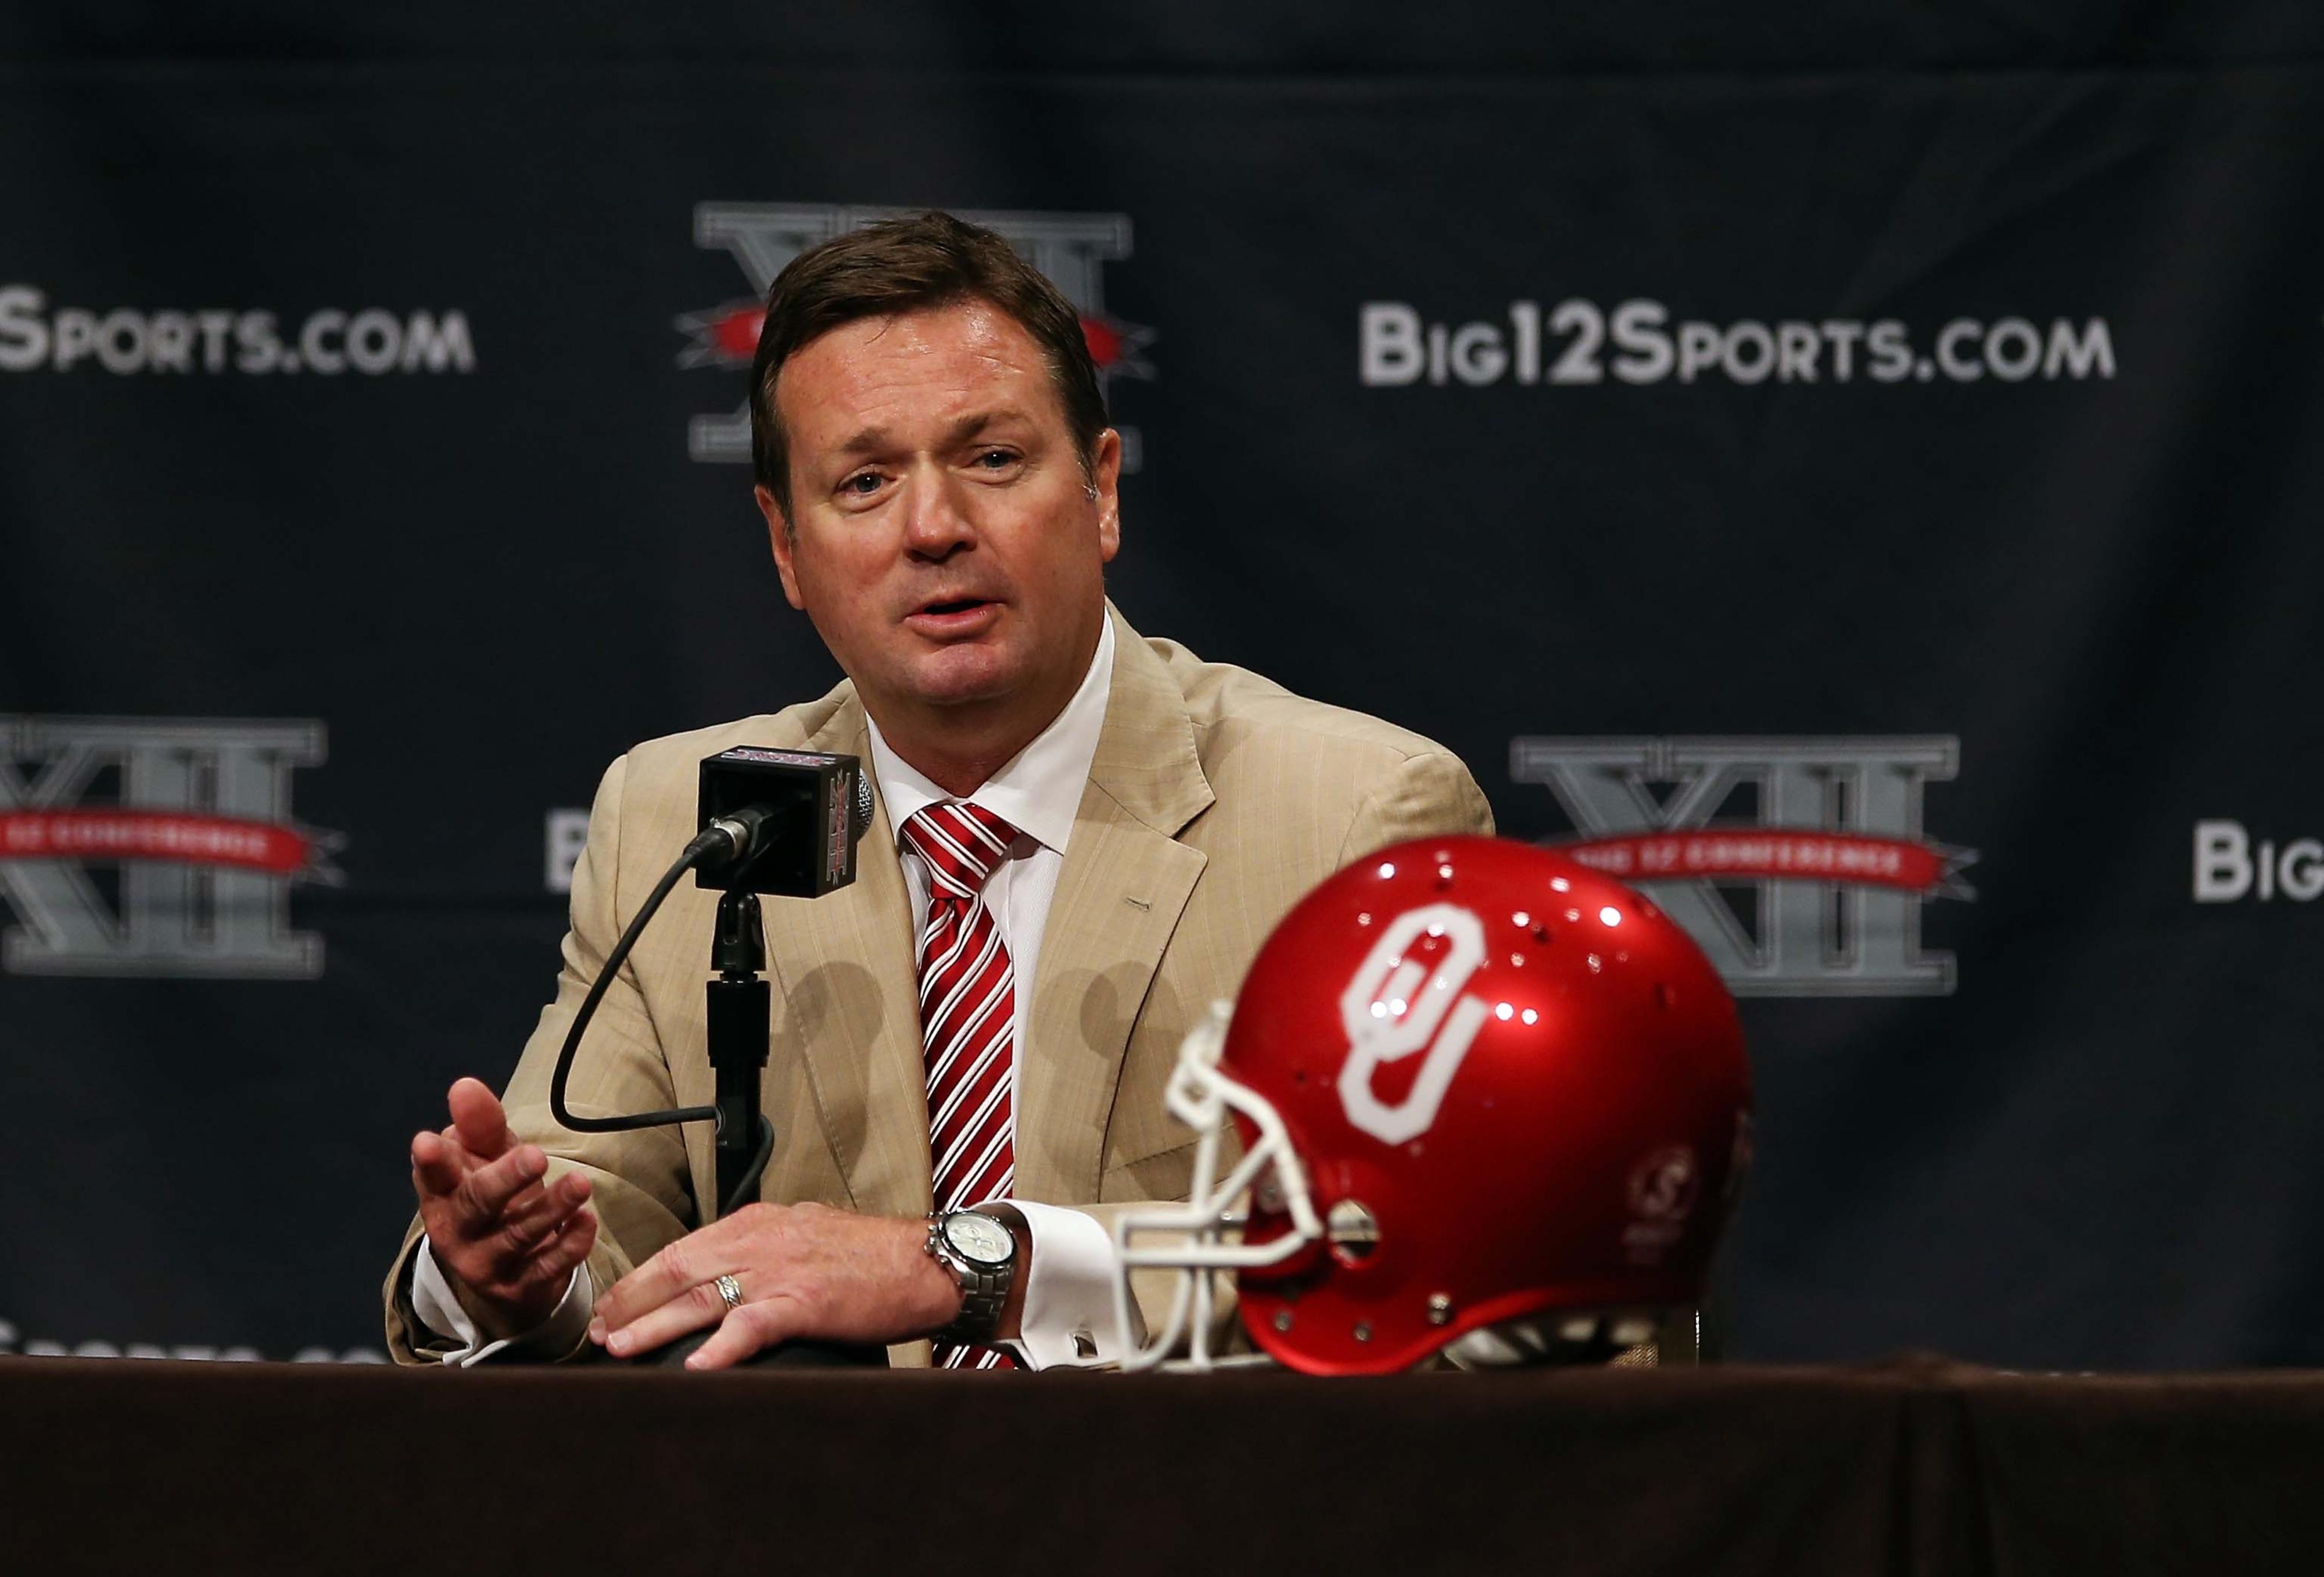 Oklahoma extends Bob Stoops through 2020